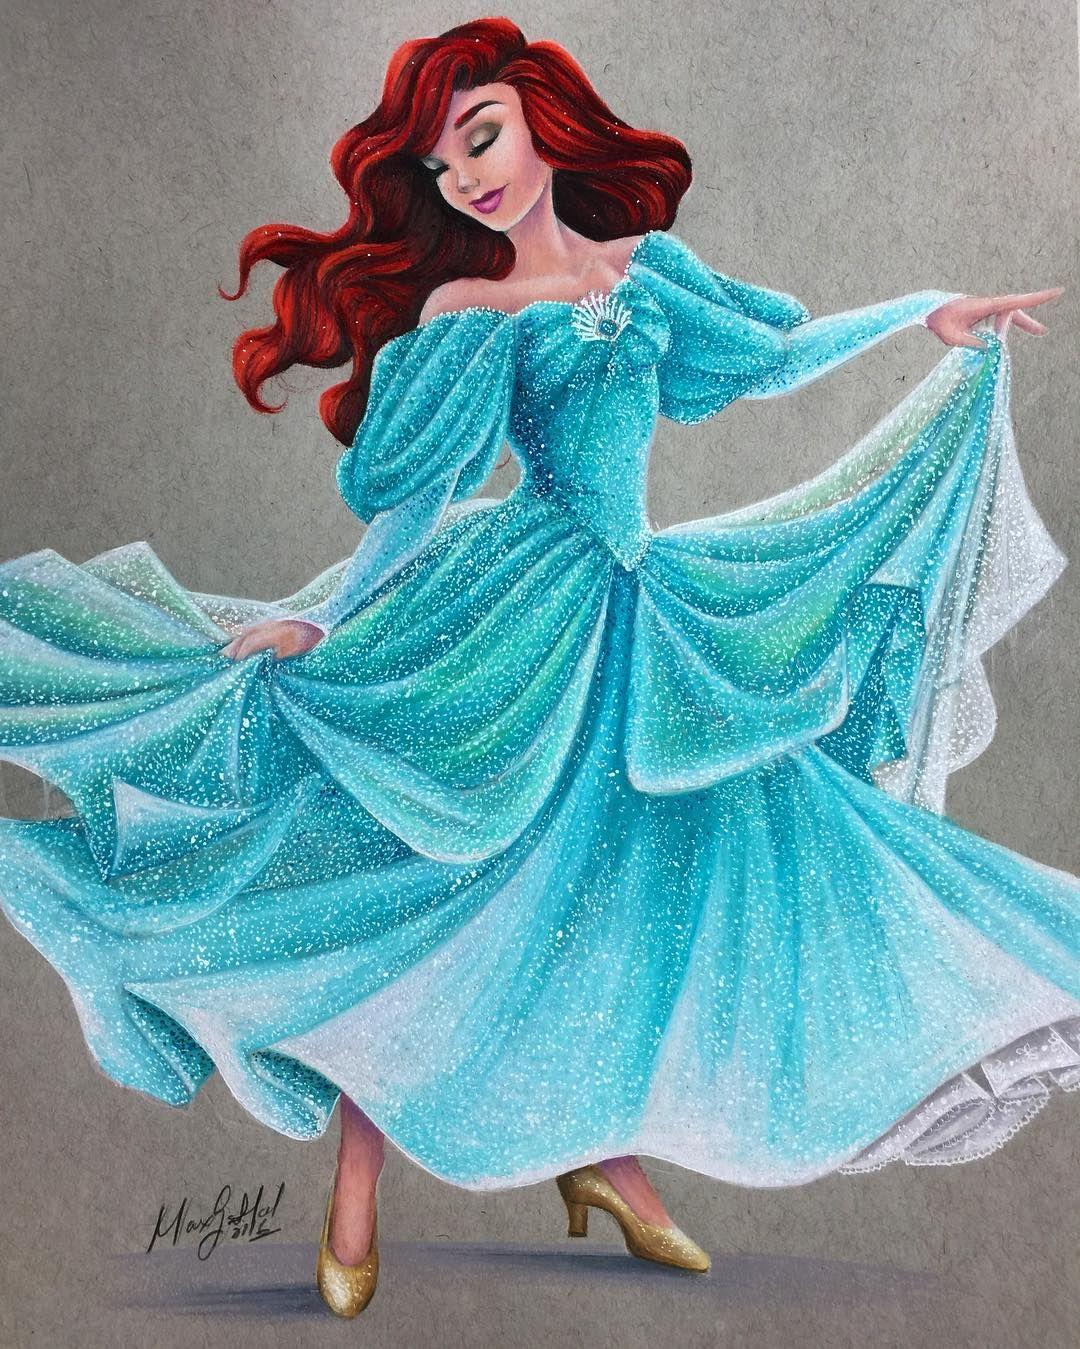 The Little Prince Uploaded By Vytaa On We Heart It: Disney, Disney Drawings, Disney